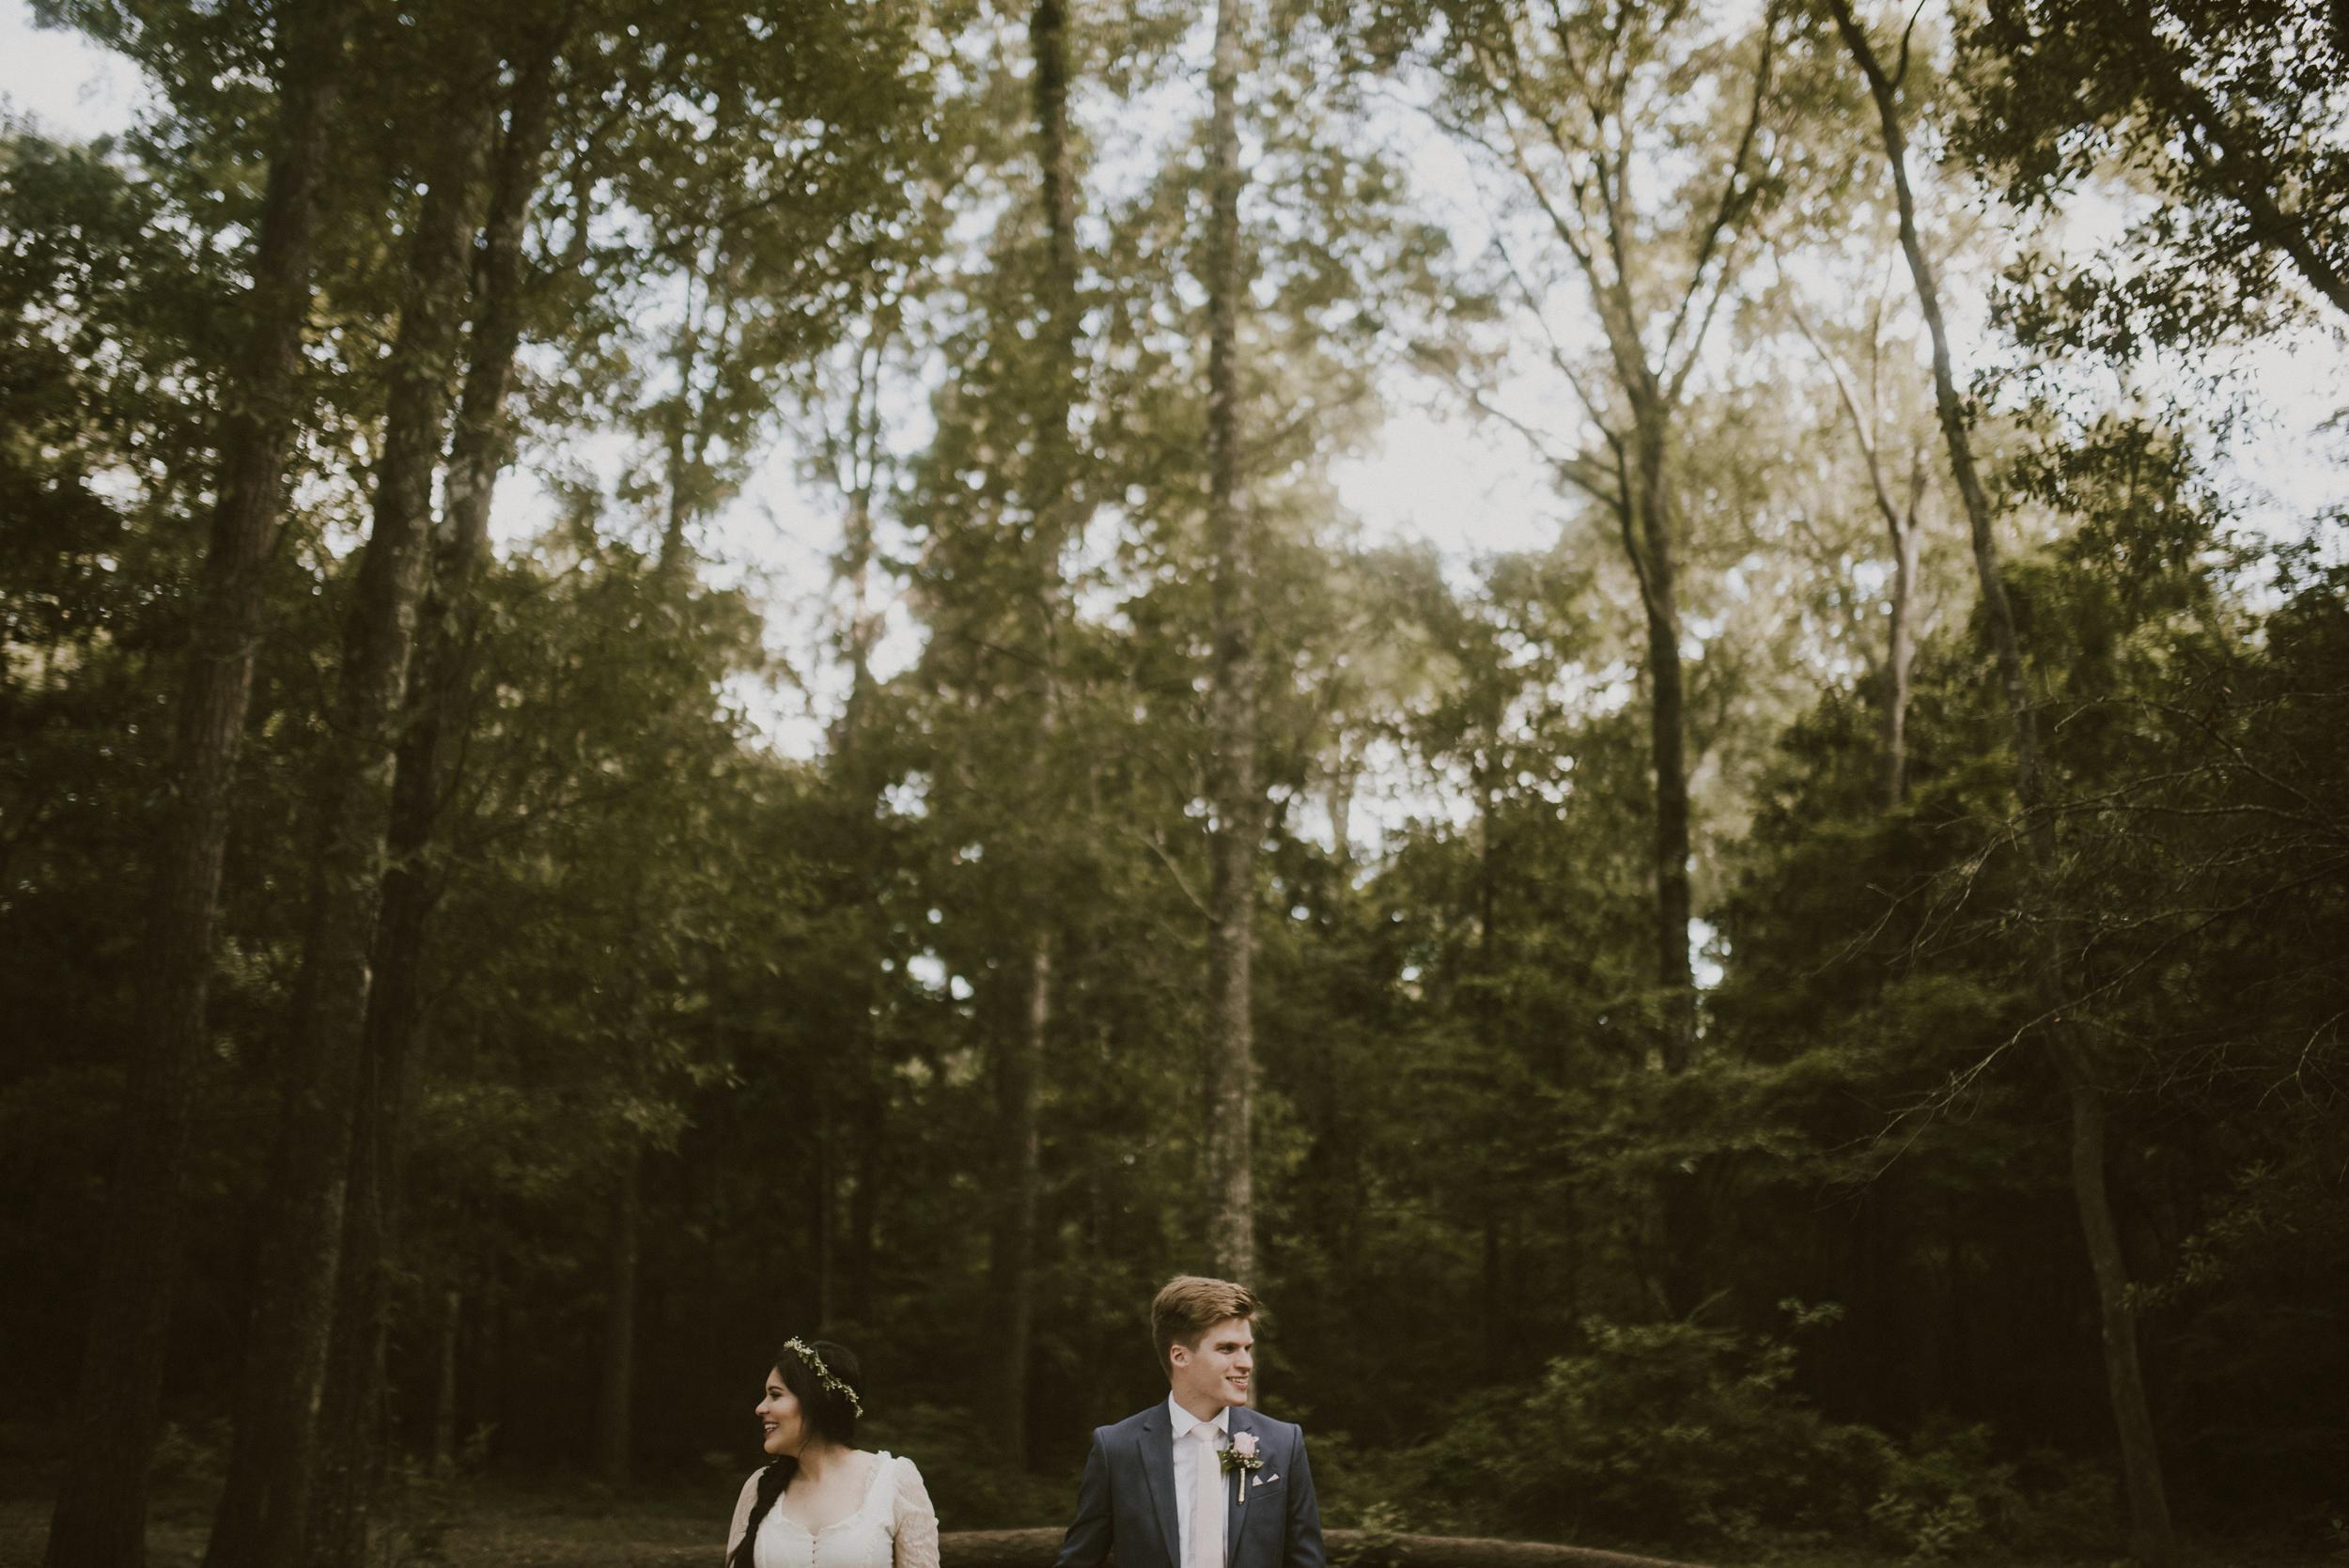 ofRen_weddingphotographer-146.jpg